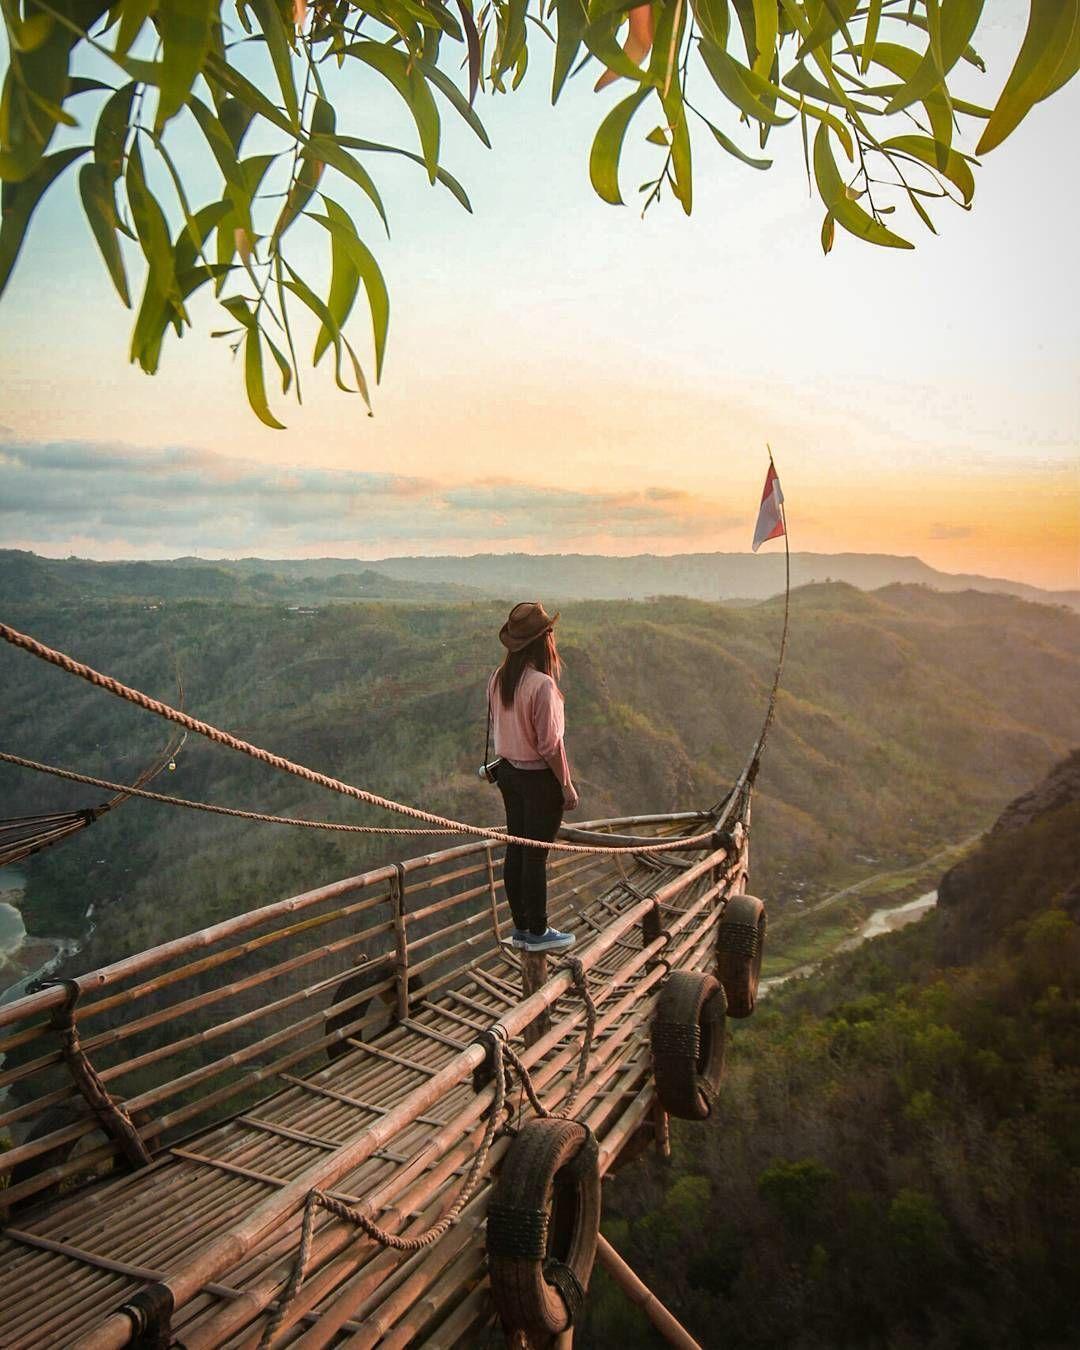 5 Lokasi Wisata di Yogyakarta yang Lagi Hits dan Instagramable